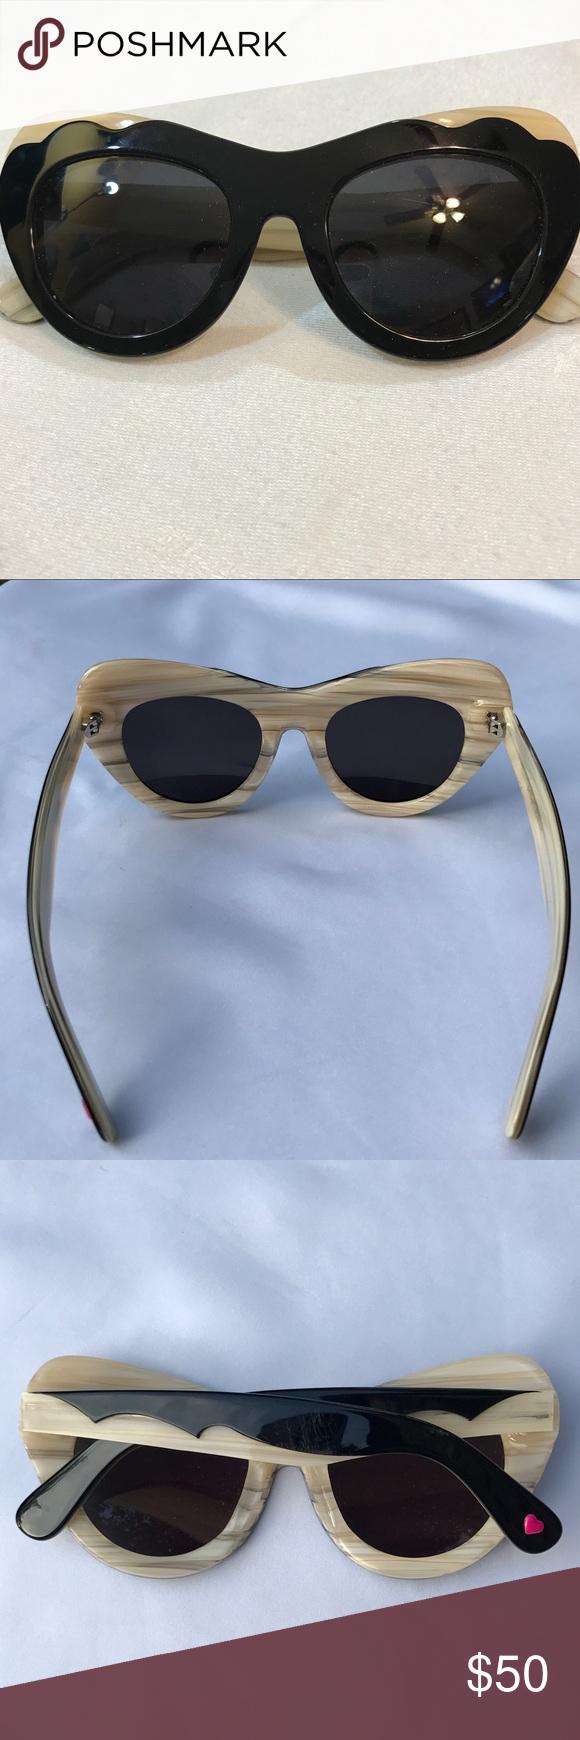 Rare Betsey Johnson Cat Eye Sunglasses